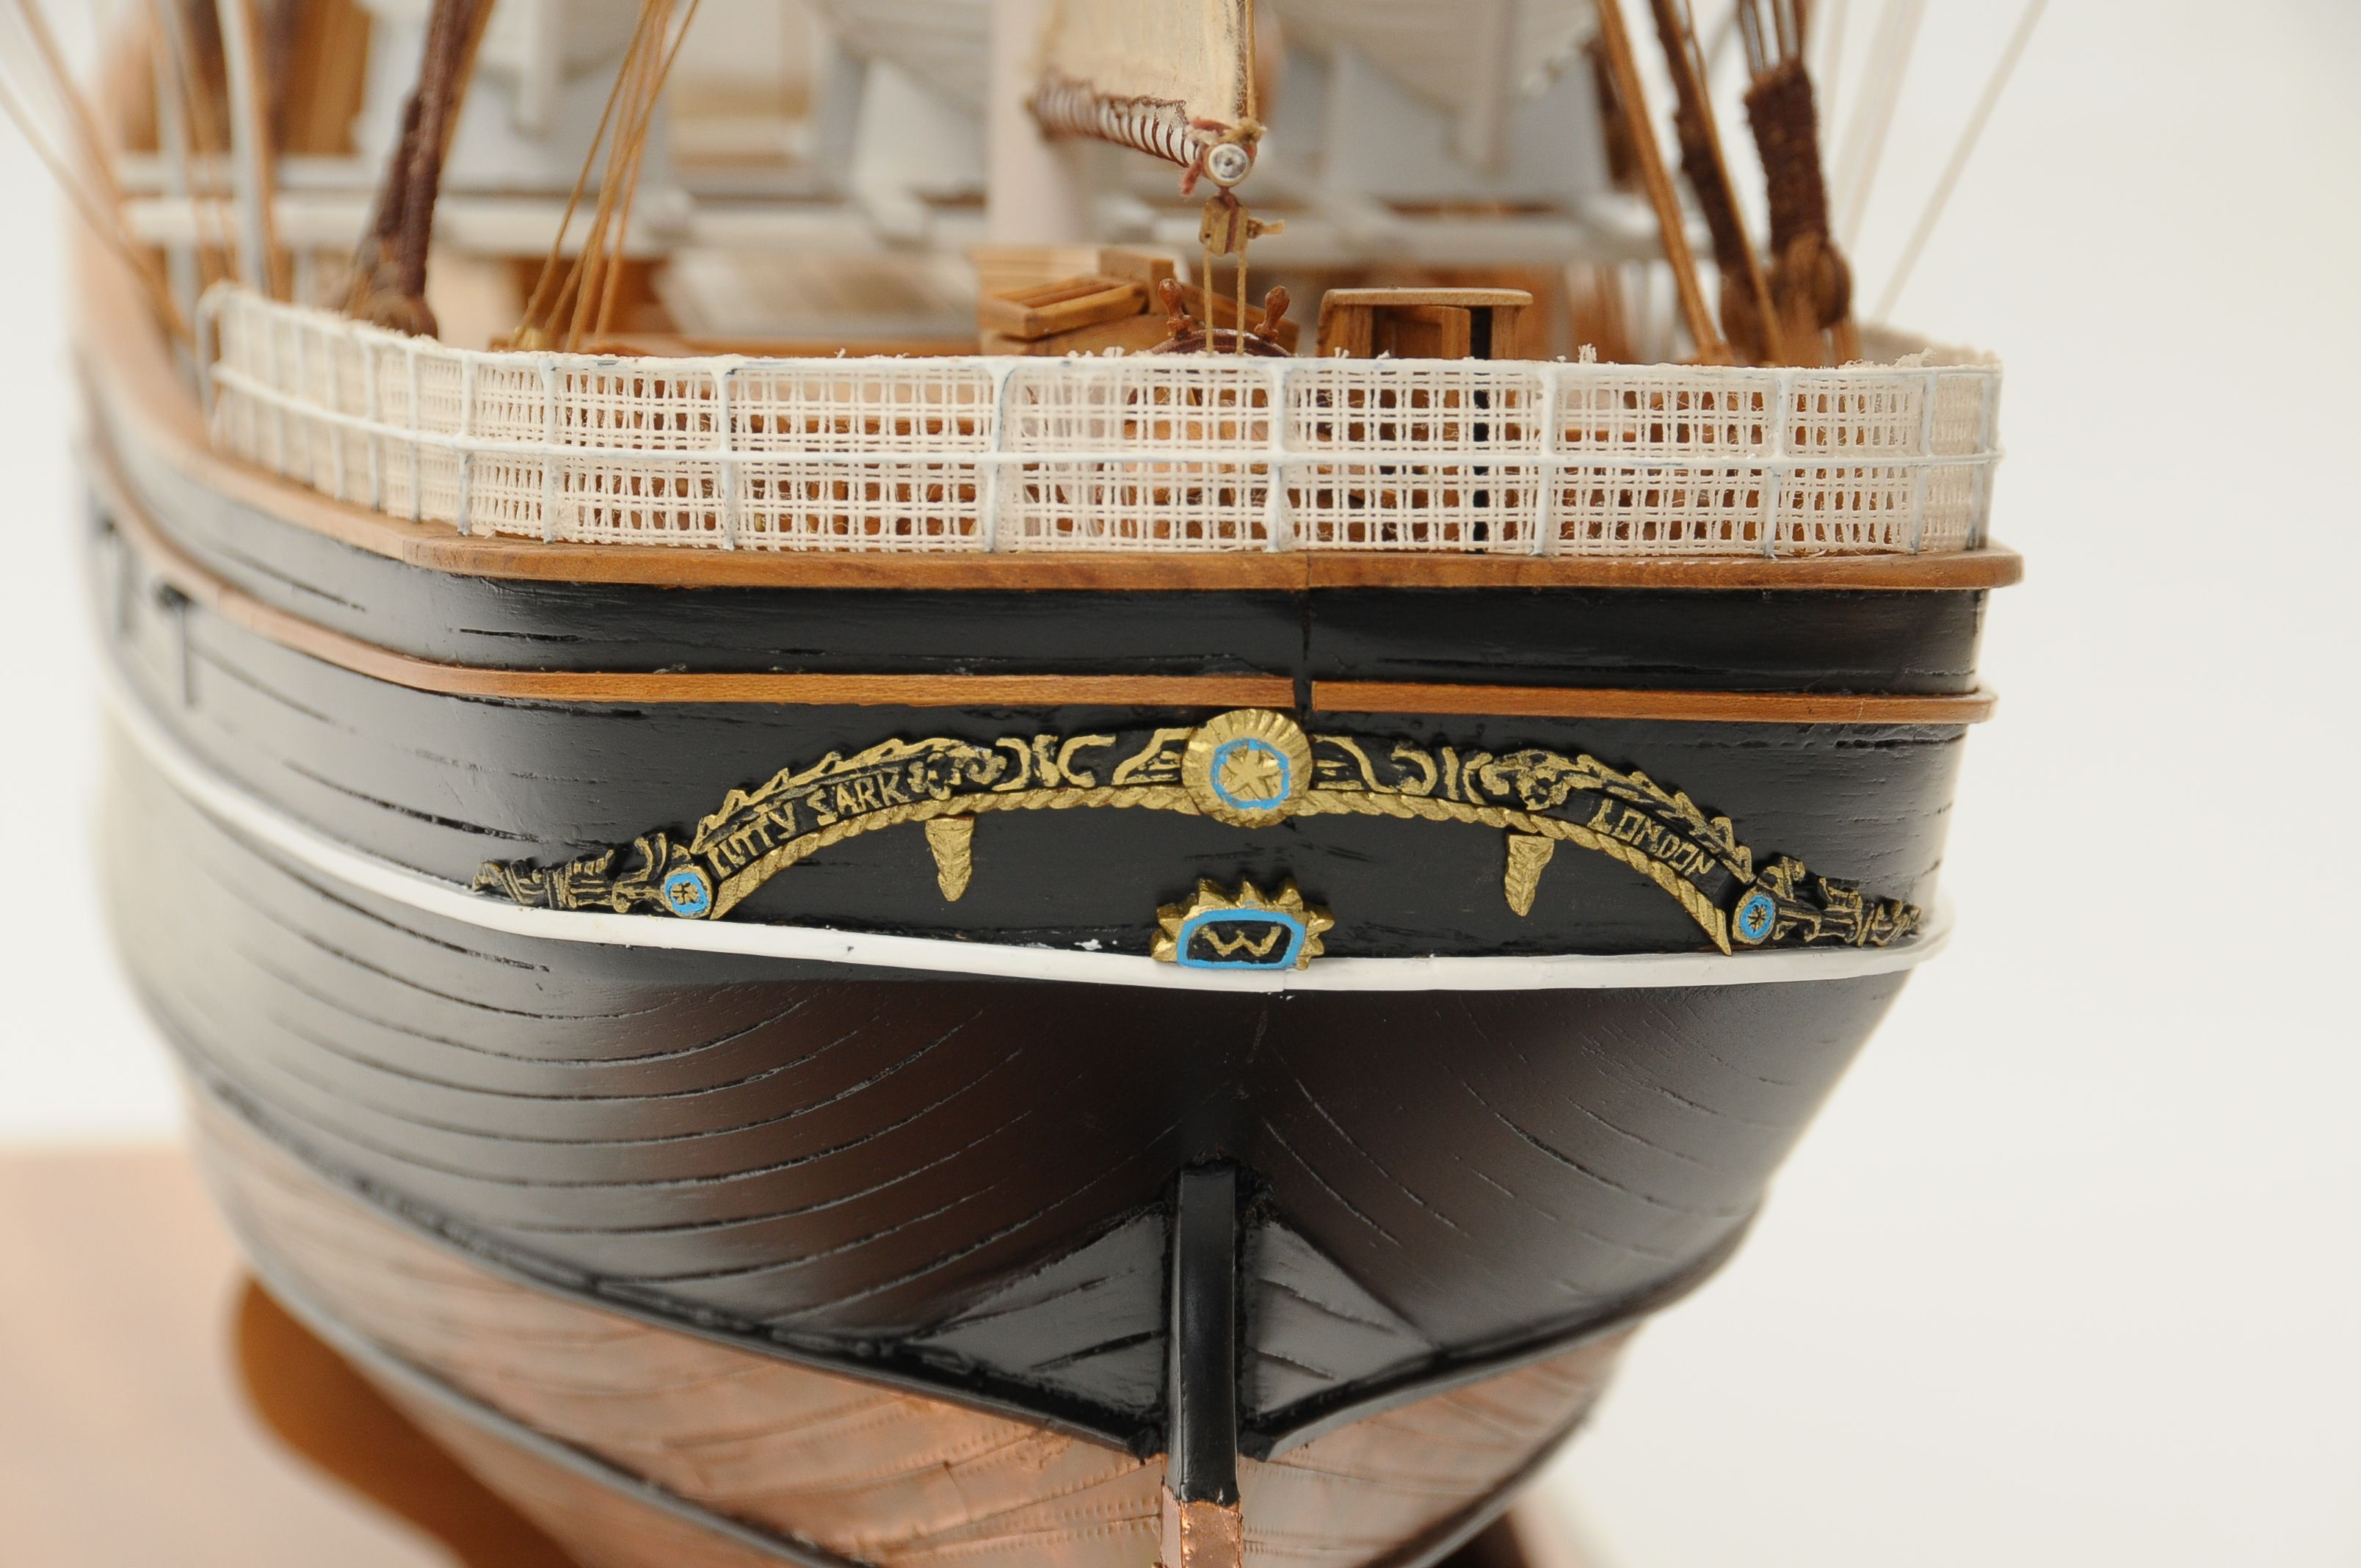 553-8681-Cutty-Sark-model-ship-Premier-Range